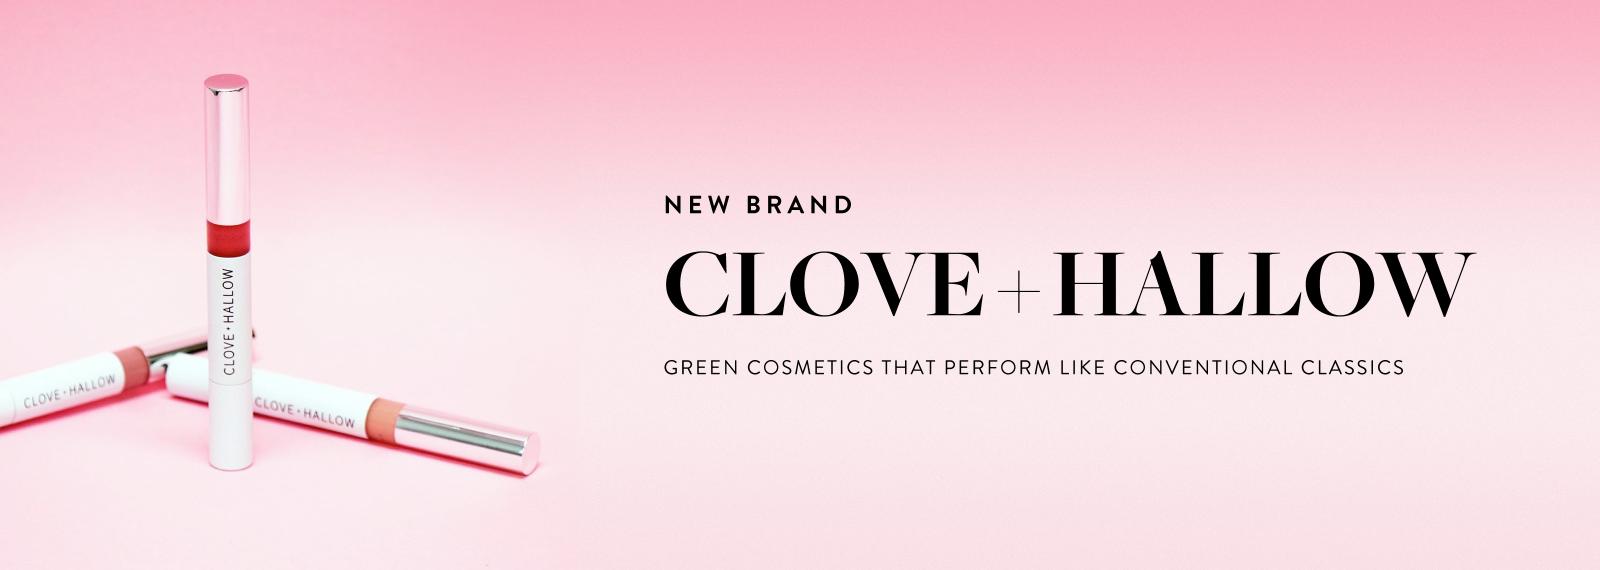 New Brand - CLOVE + HALLOW